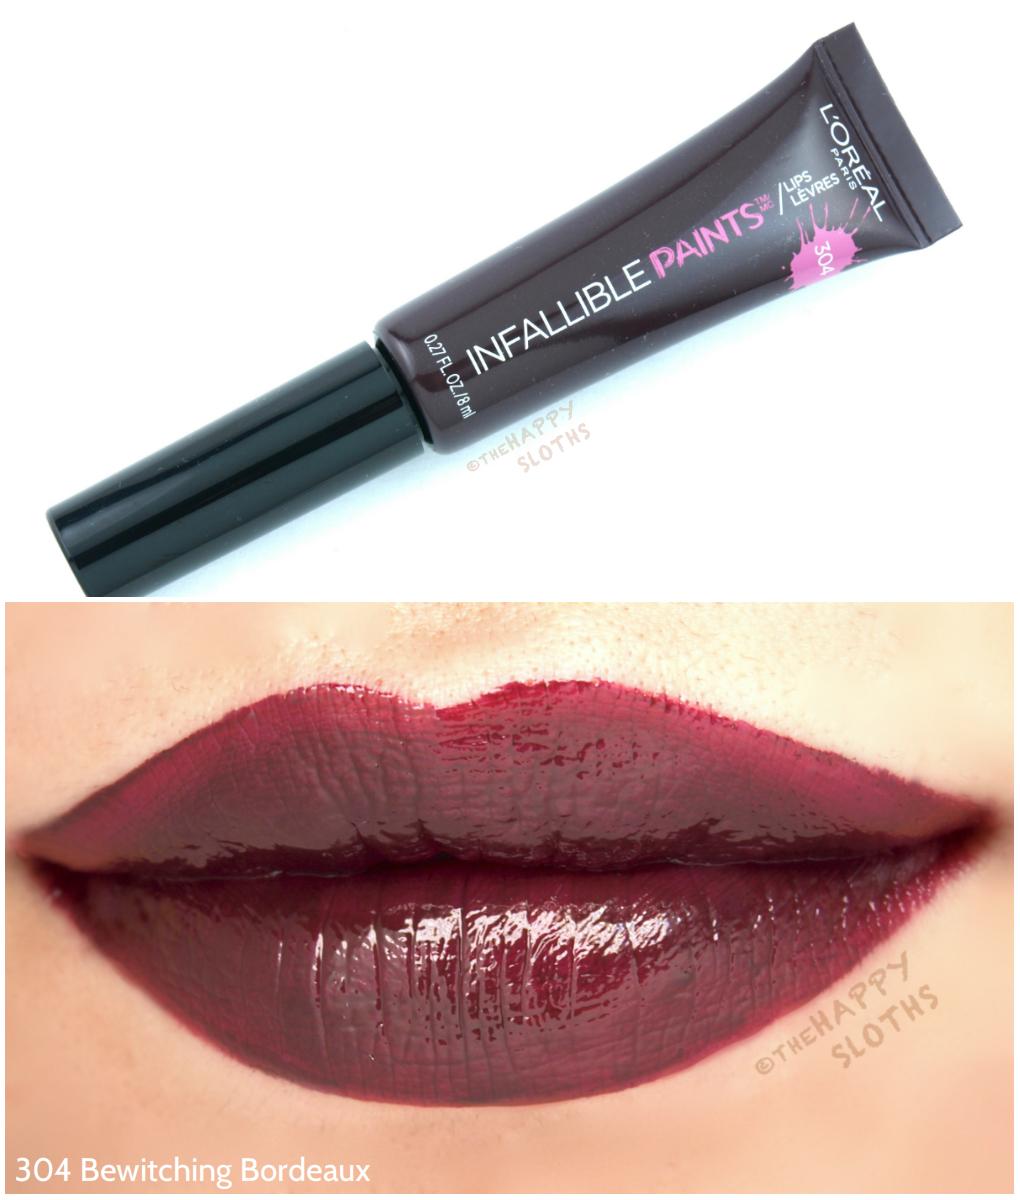 L'Oreal Infallible Lip Paints 304 Bewitching Bordeaux